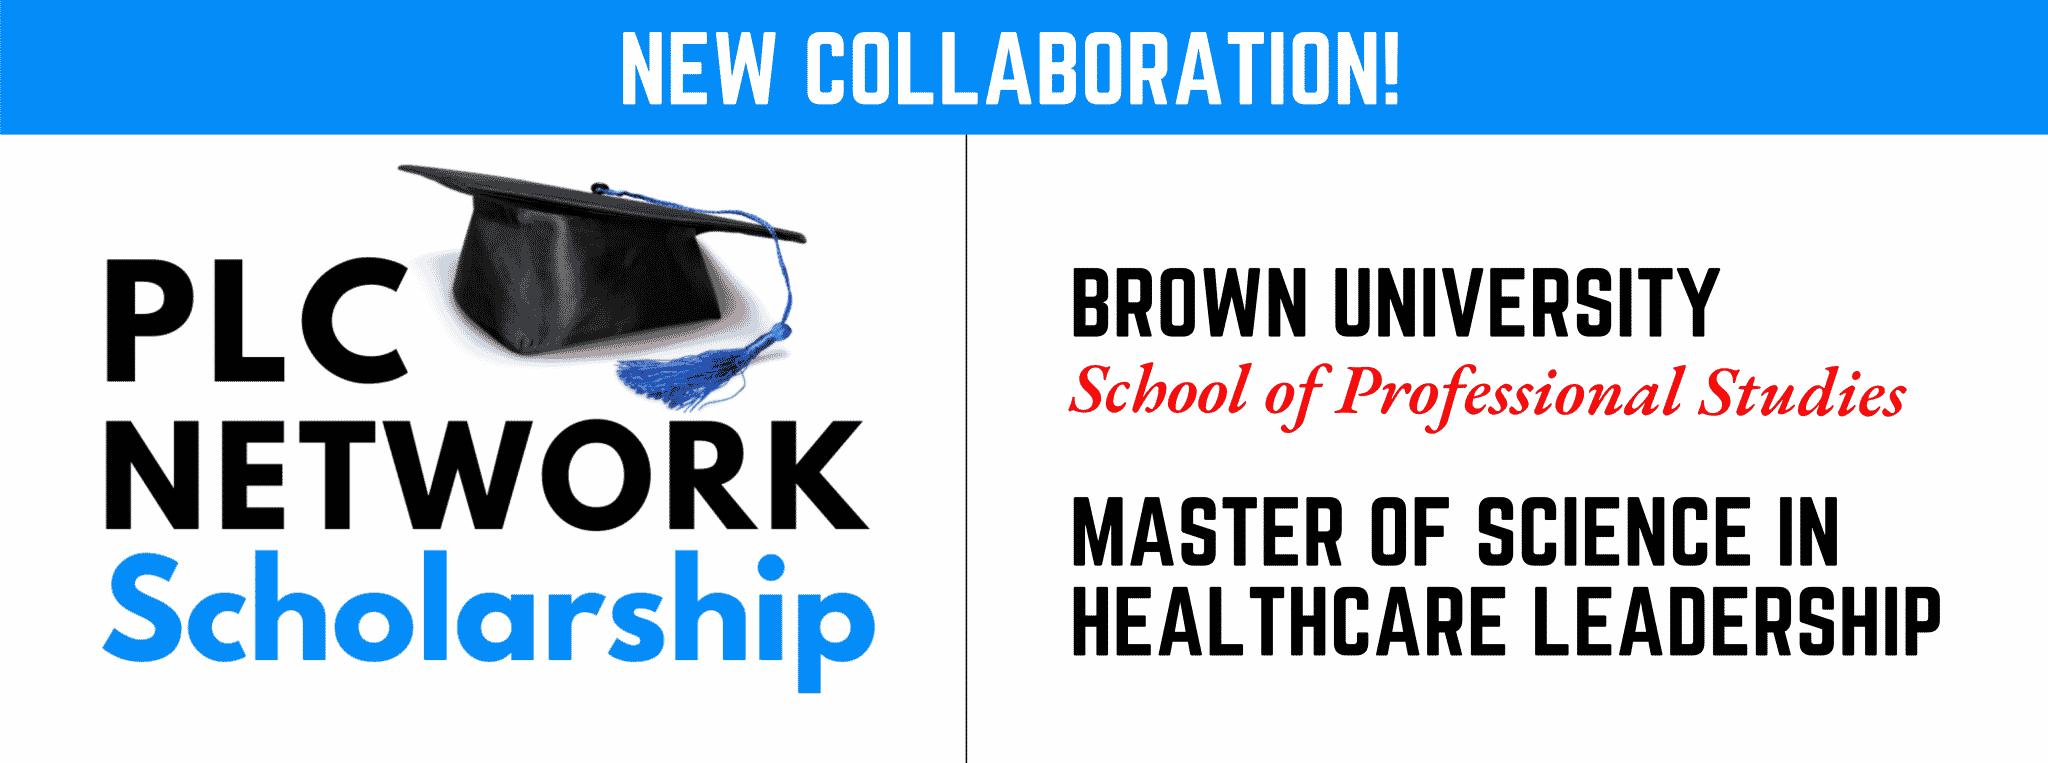 Brown_PLC-Network Homepage Image